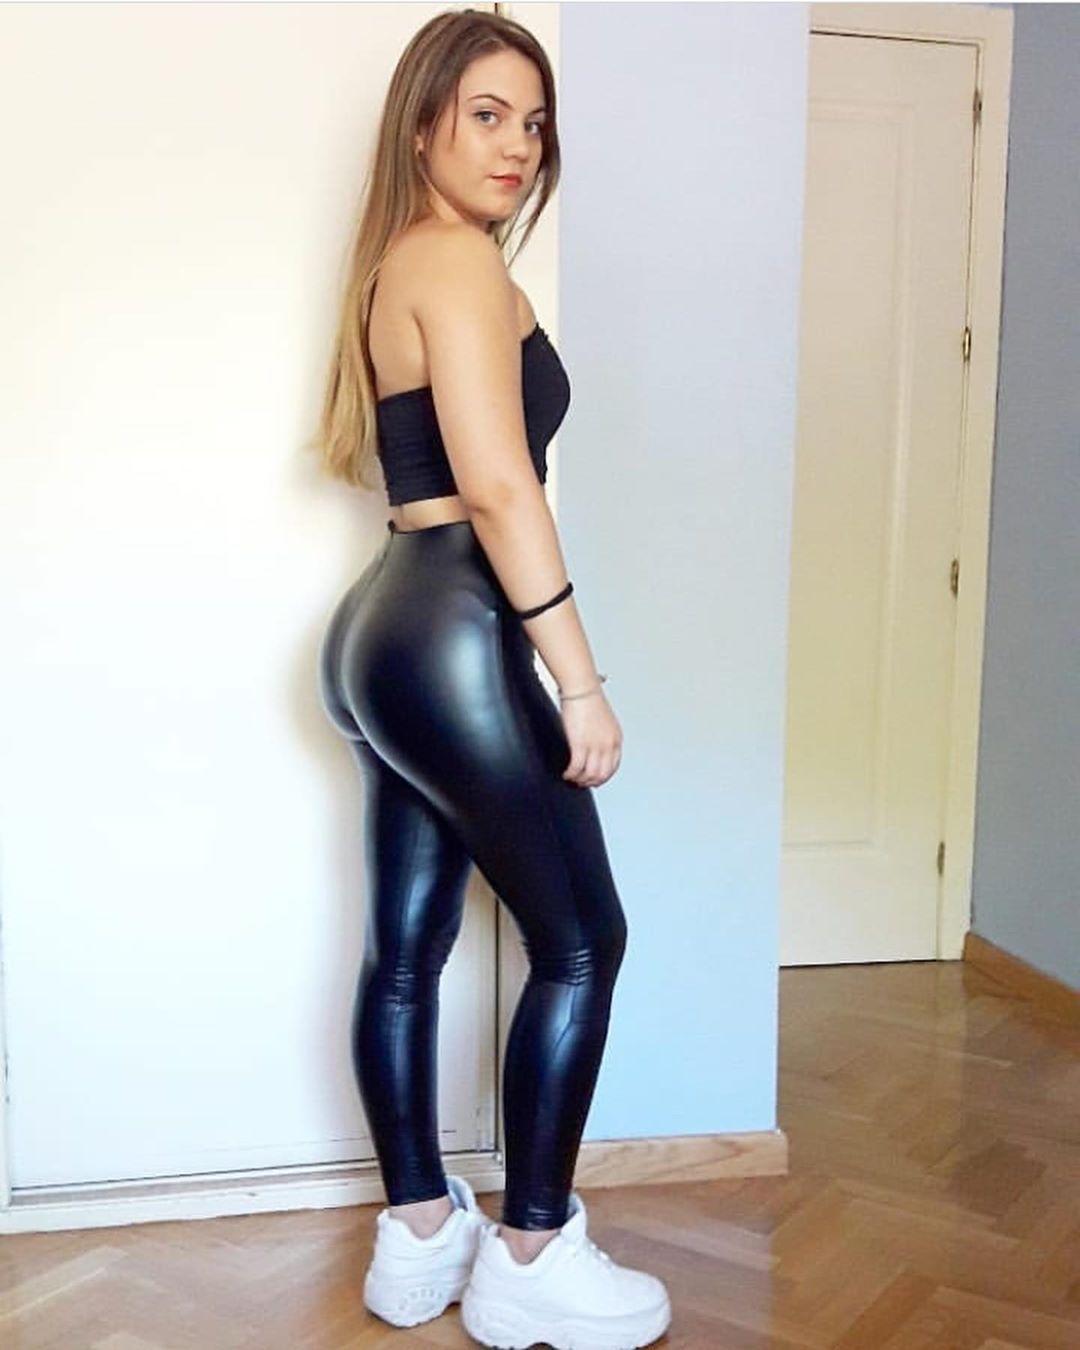 Amateur erotische Frau